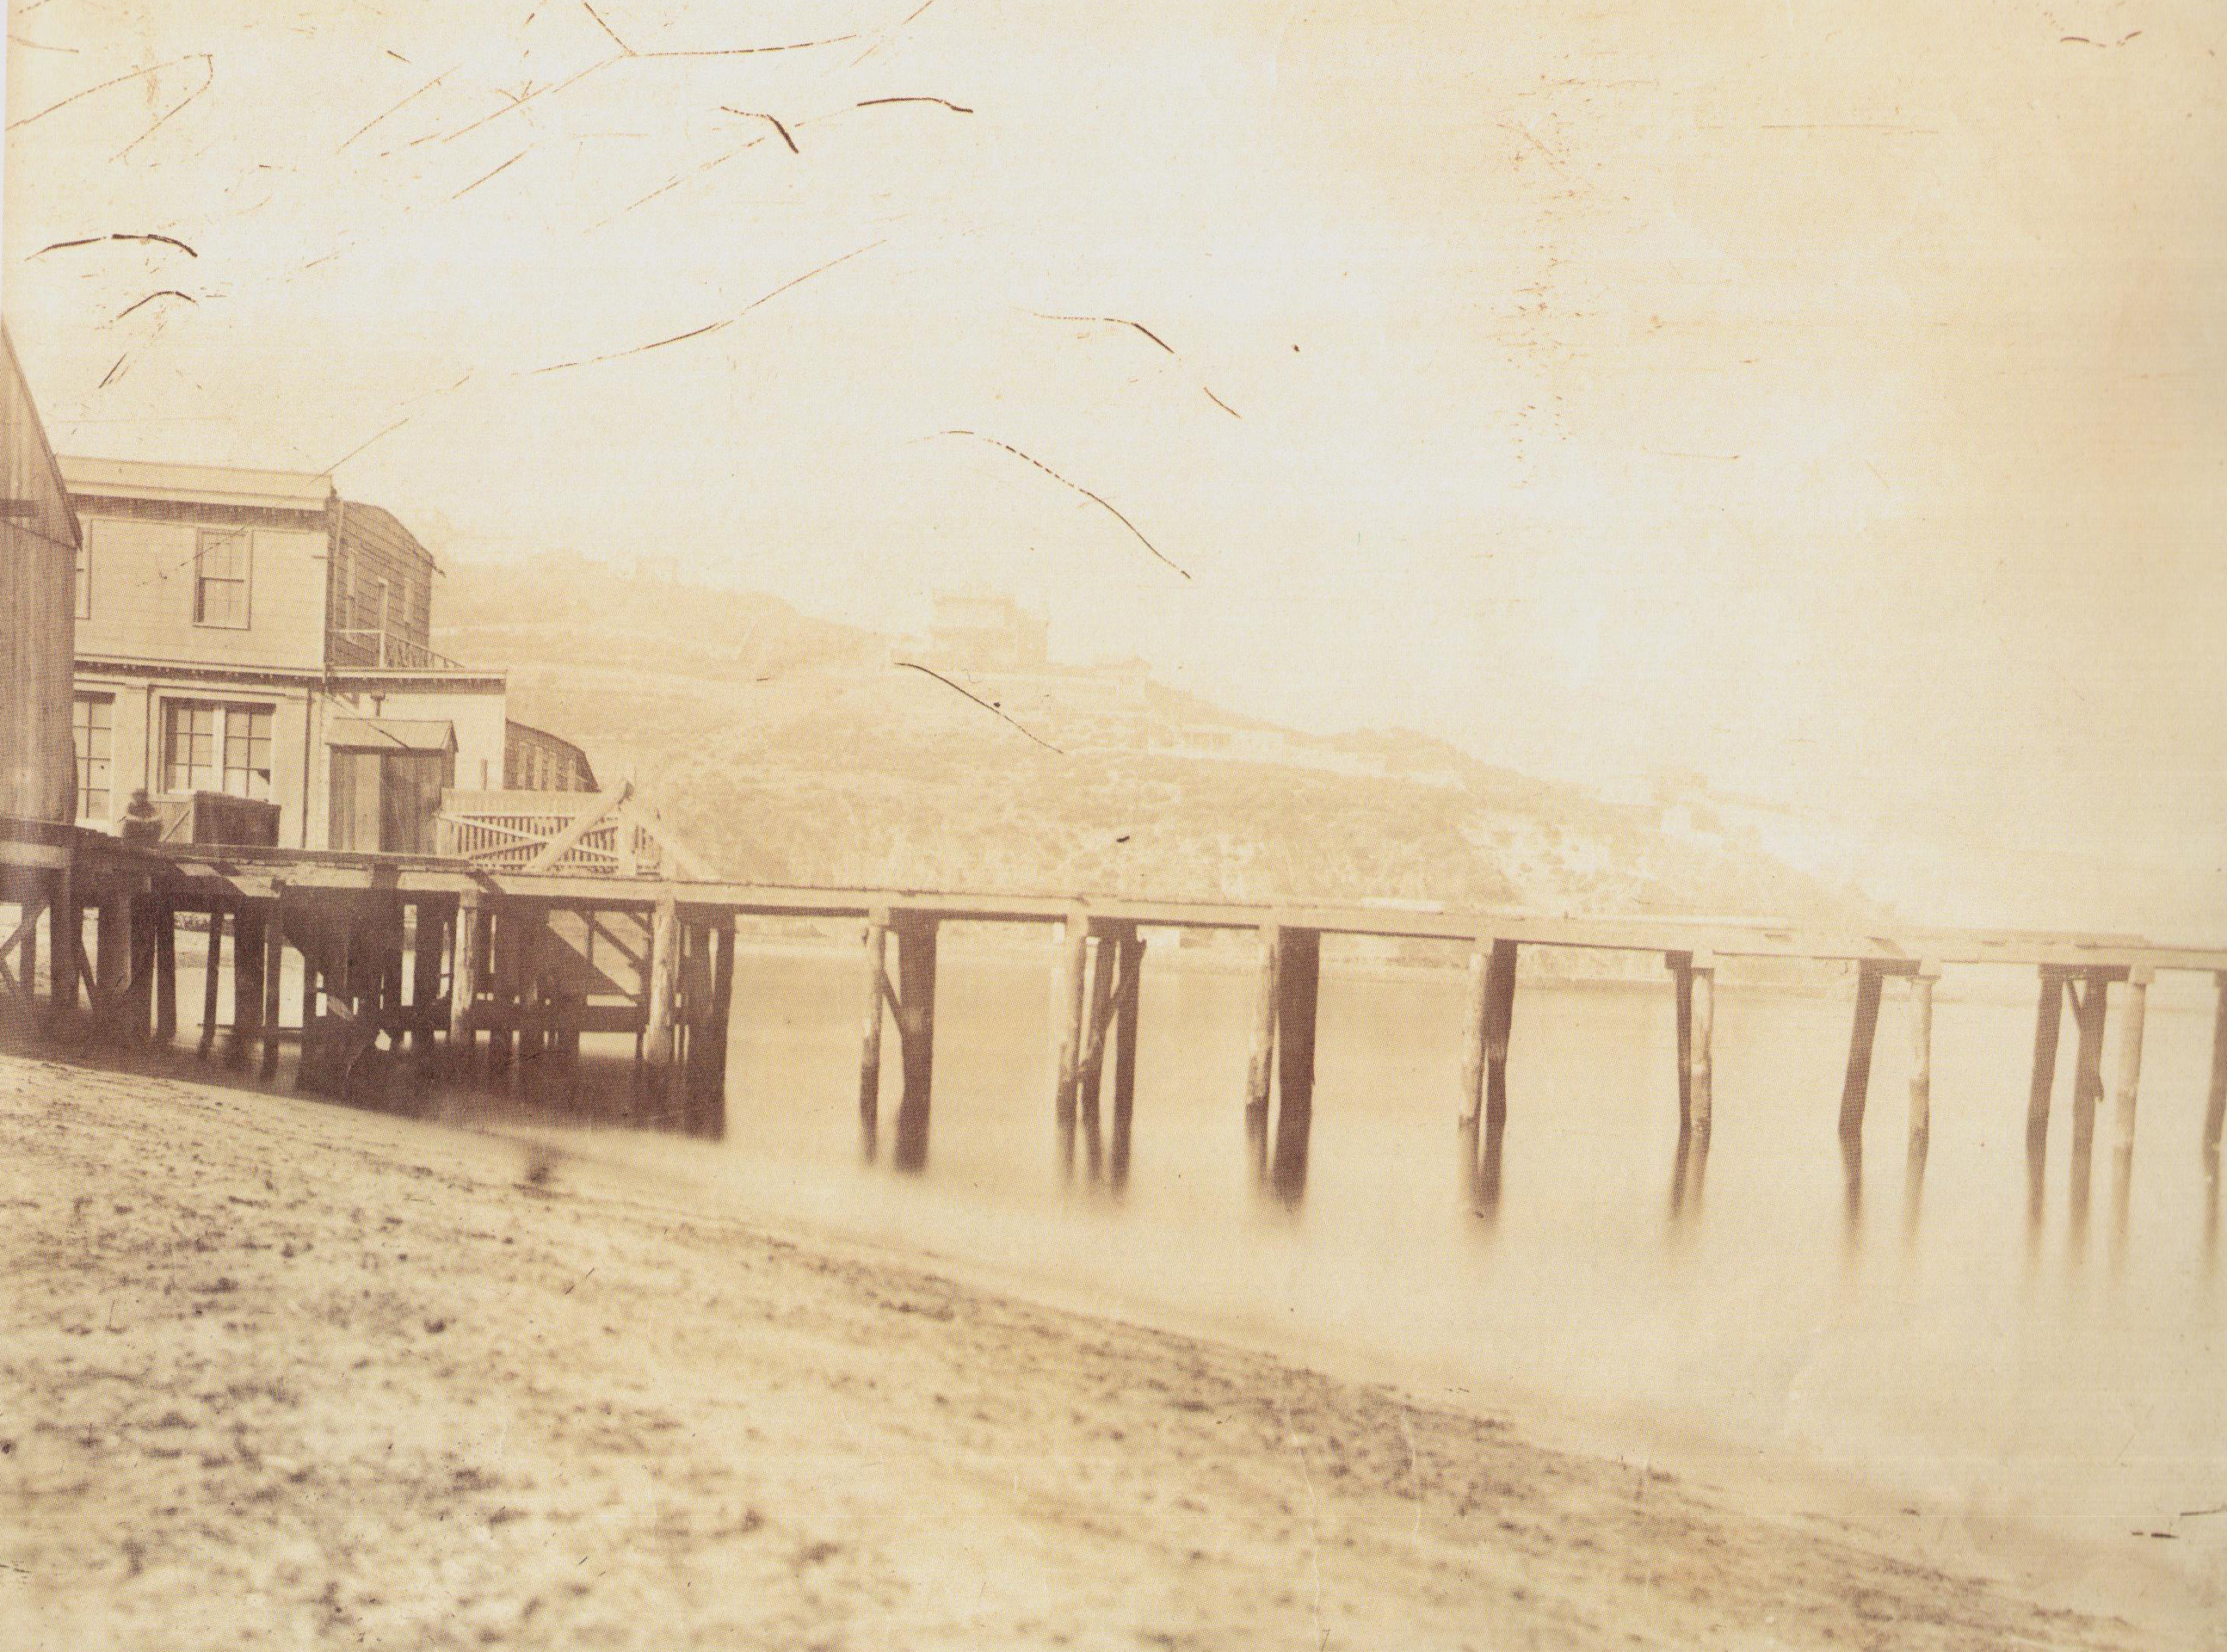 Enterreno - Fotos históricas de chile - fotos antiguas de Chile - Vista del Balneario de Valparaíso,  1864